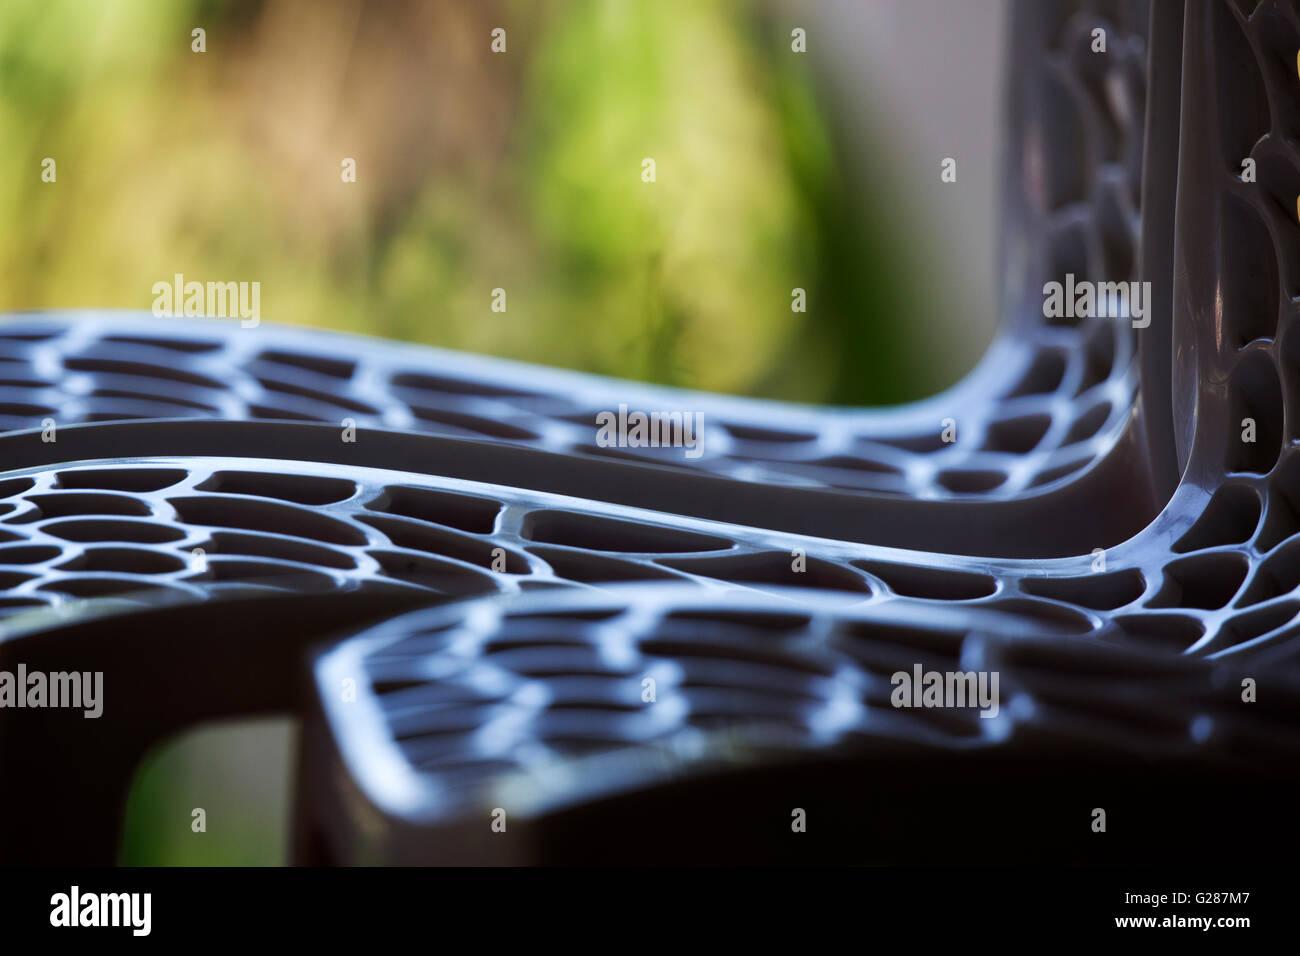 Sedia design patterns foto immagine stock alamy